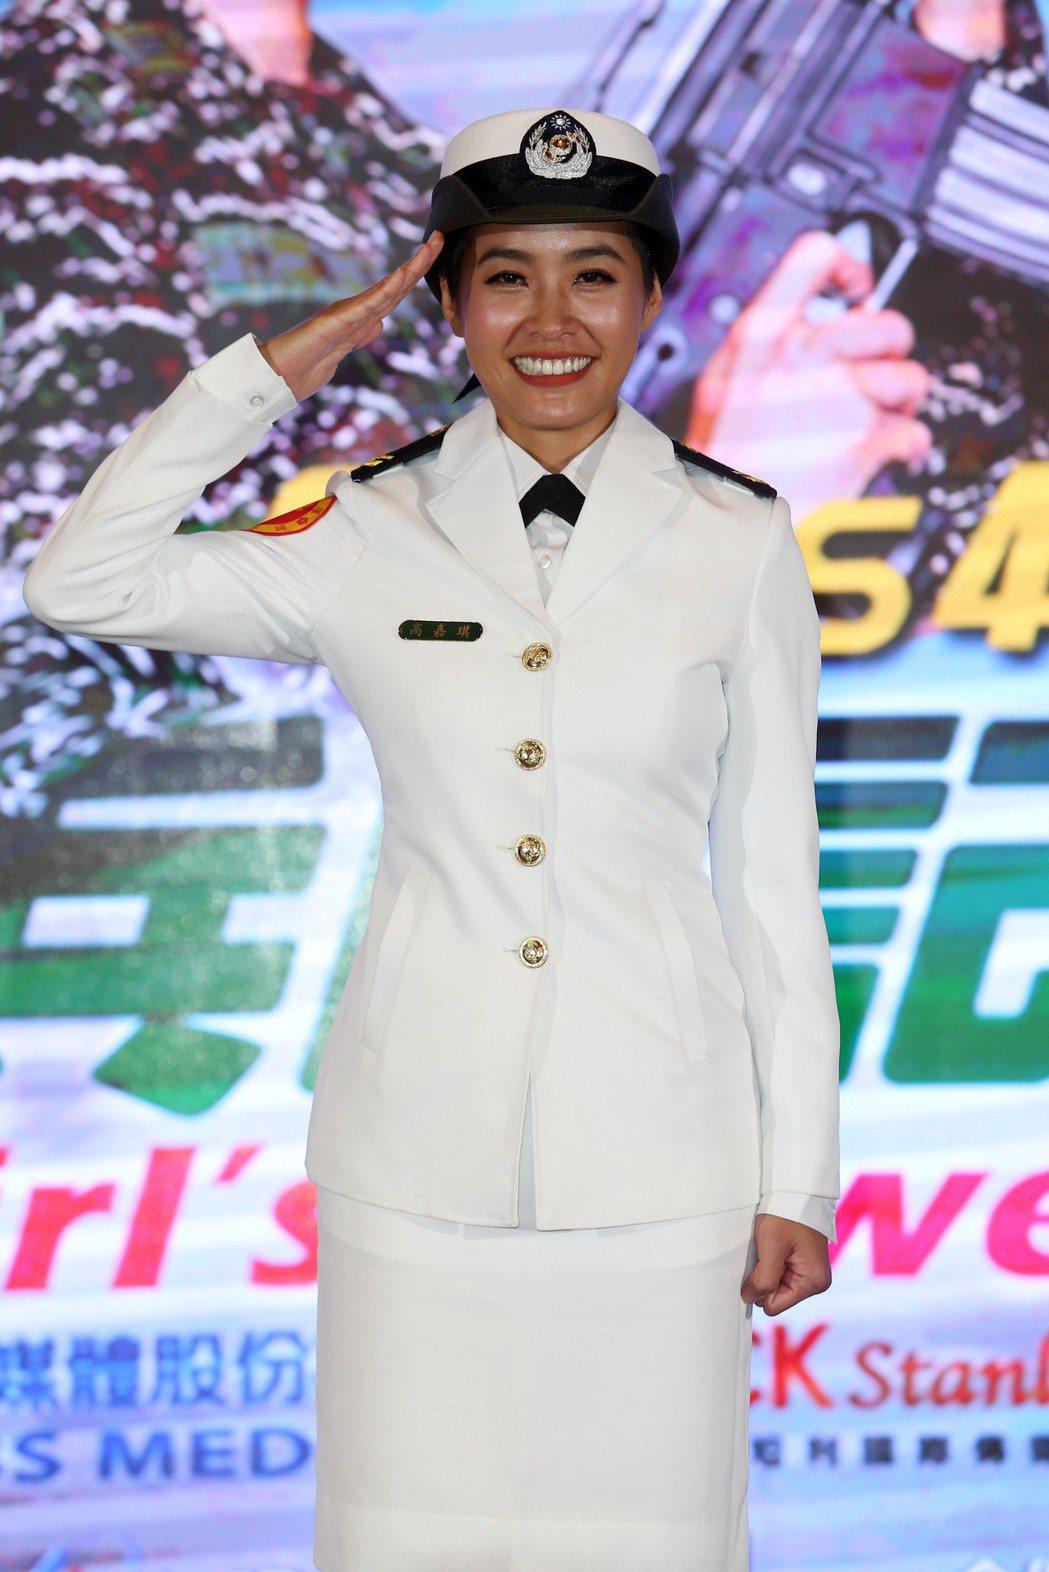 TVBS全新八點檔《女兵日記》首映會,小嫻穿著全套軍裝。記者曾吉松/攝影